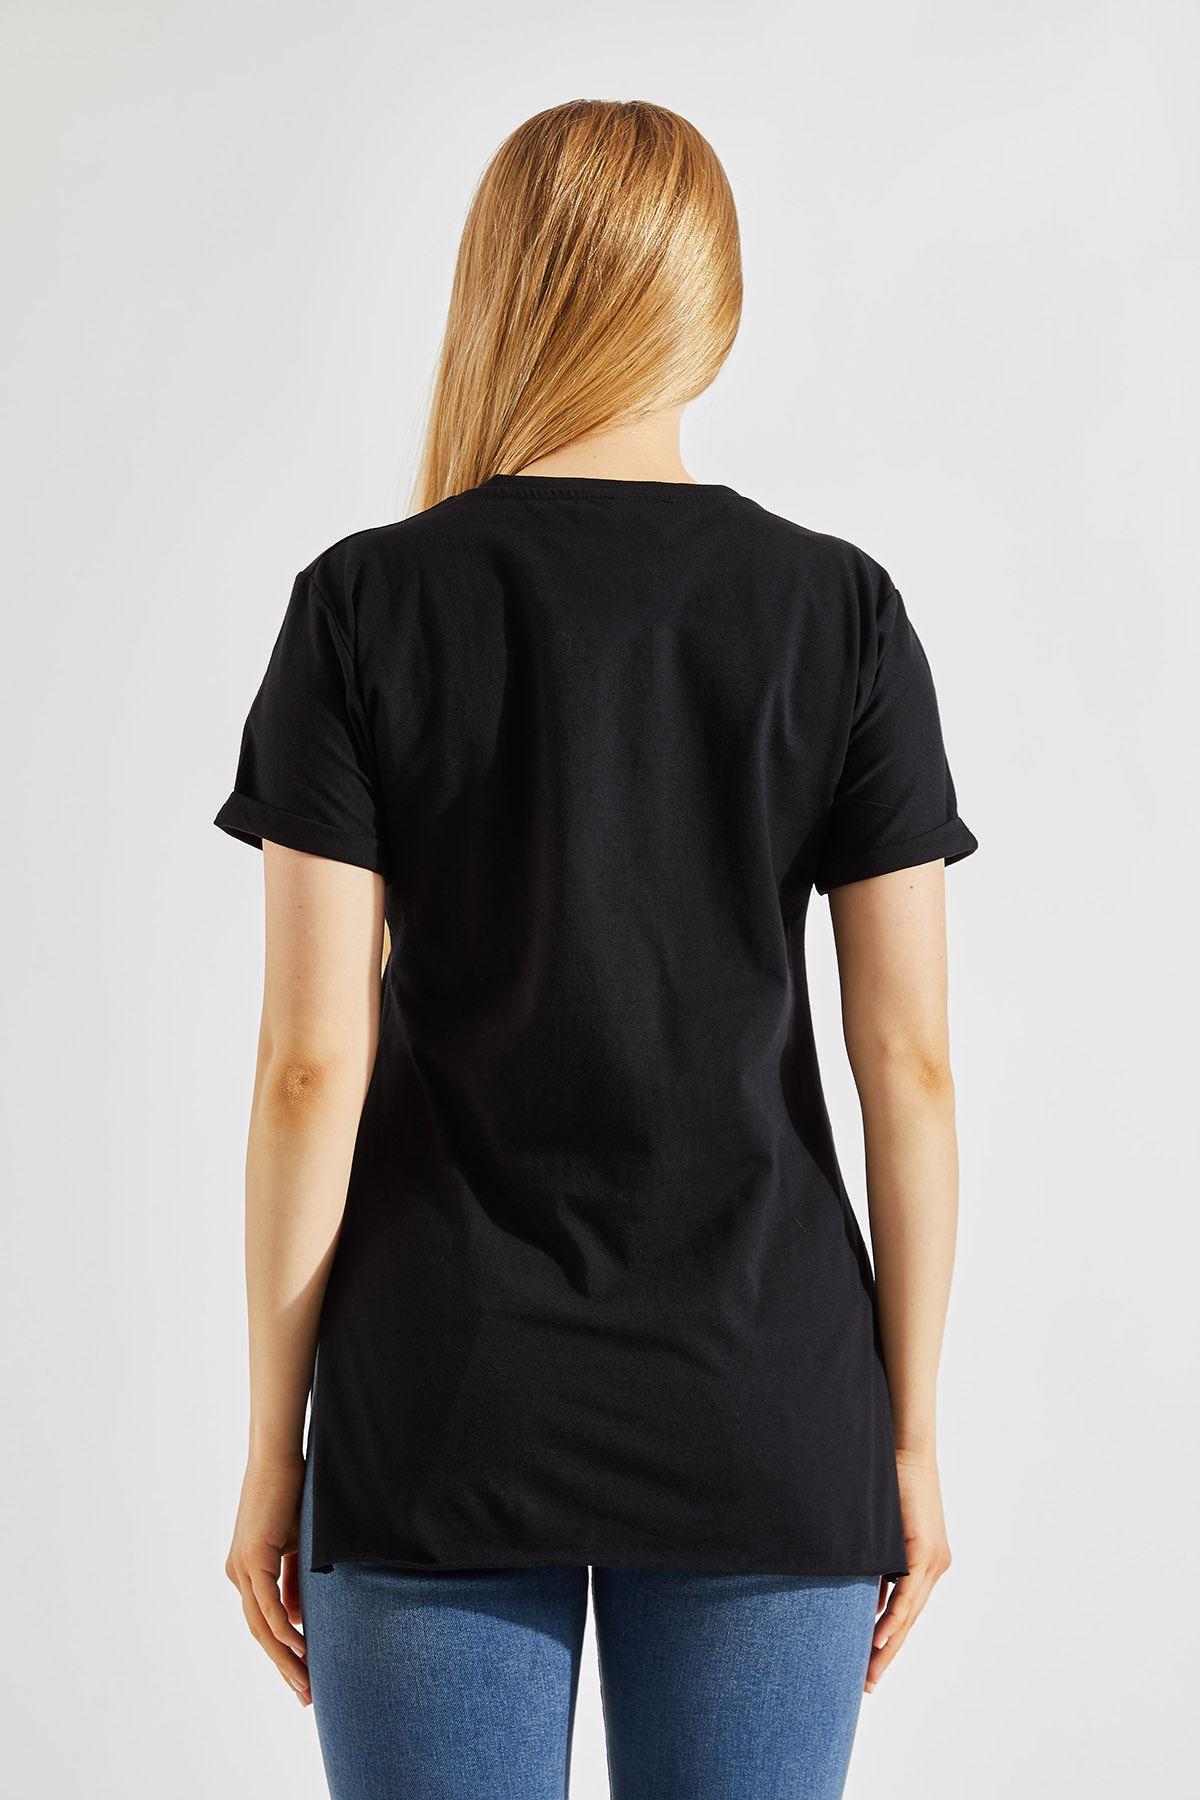 Kadın Yırtmaçlı Siyah Tişört